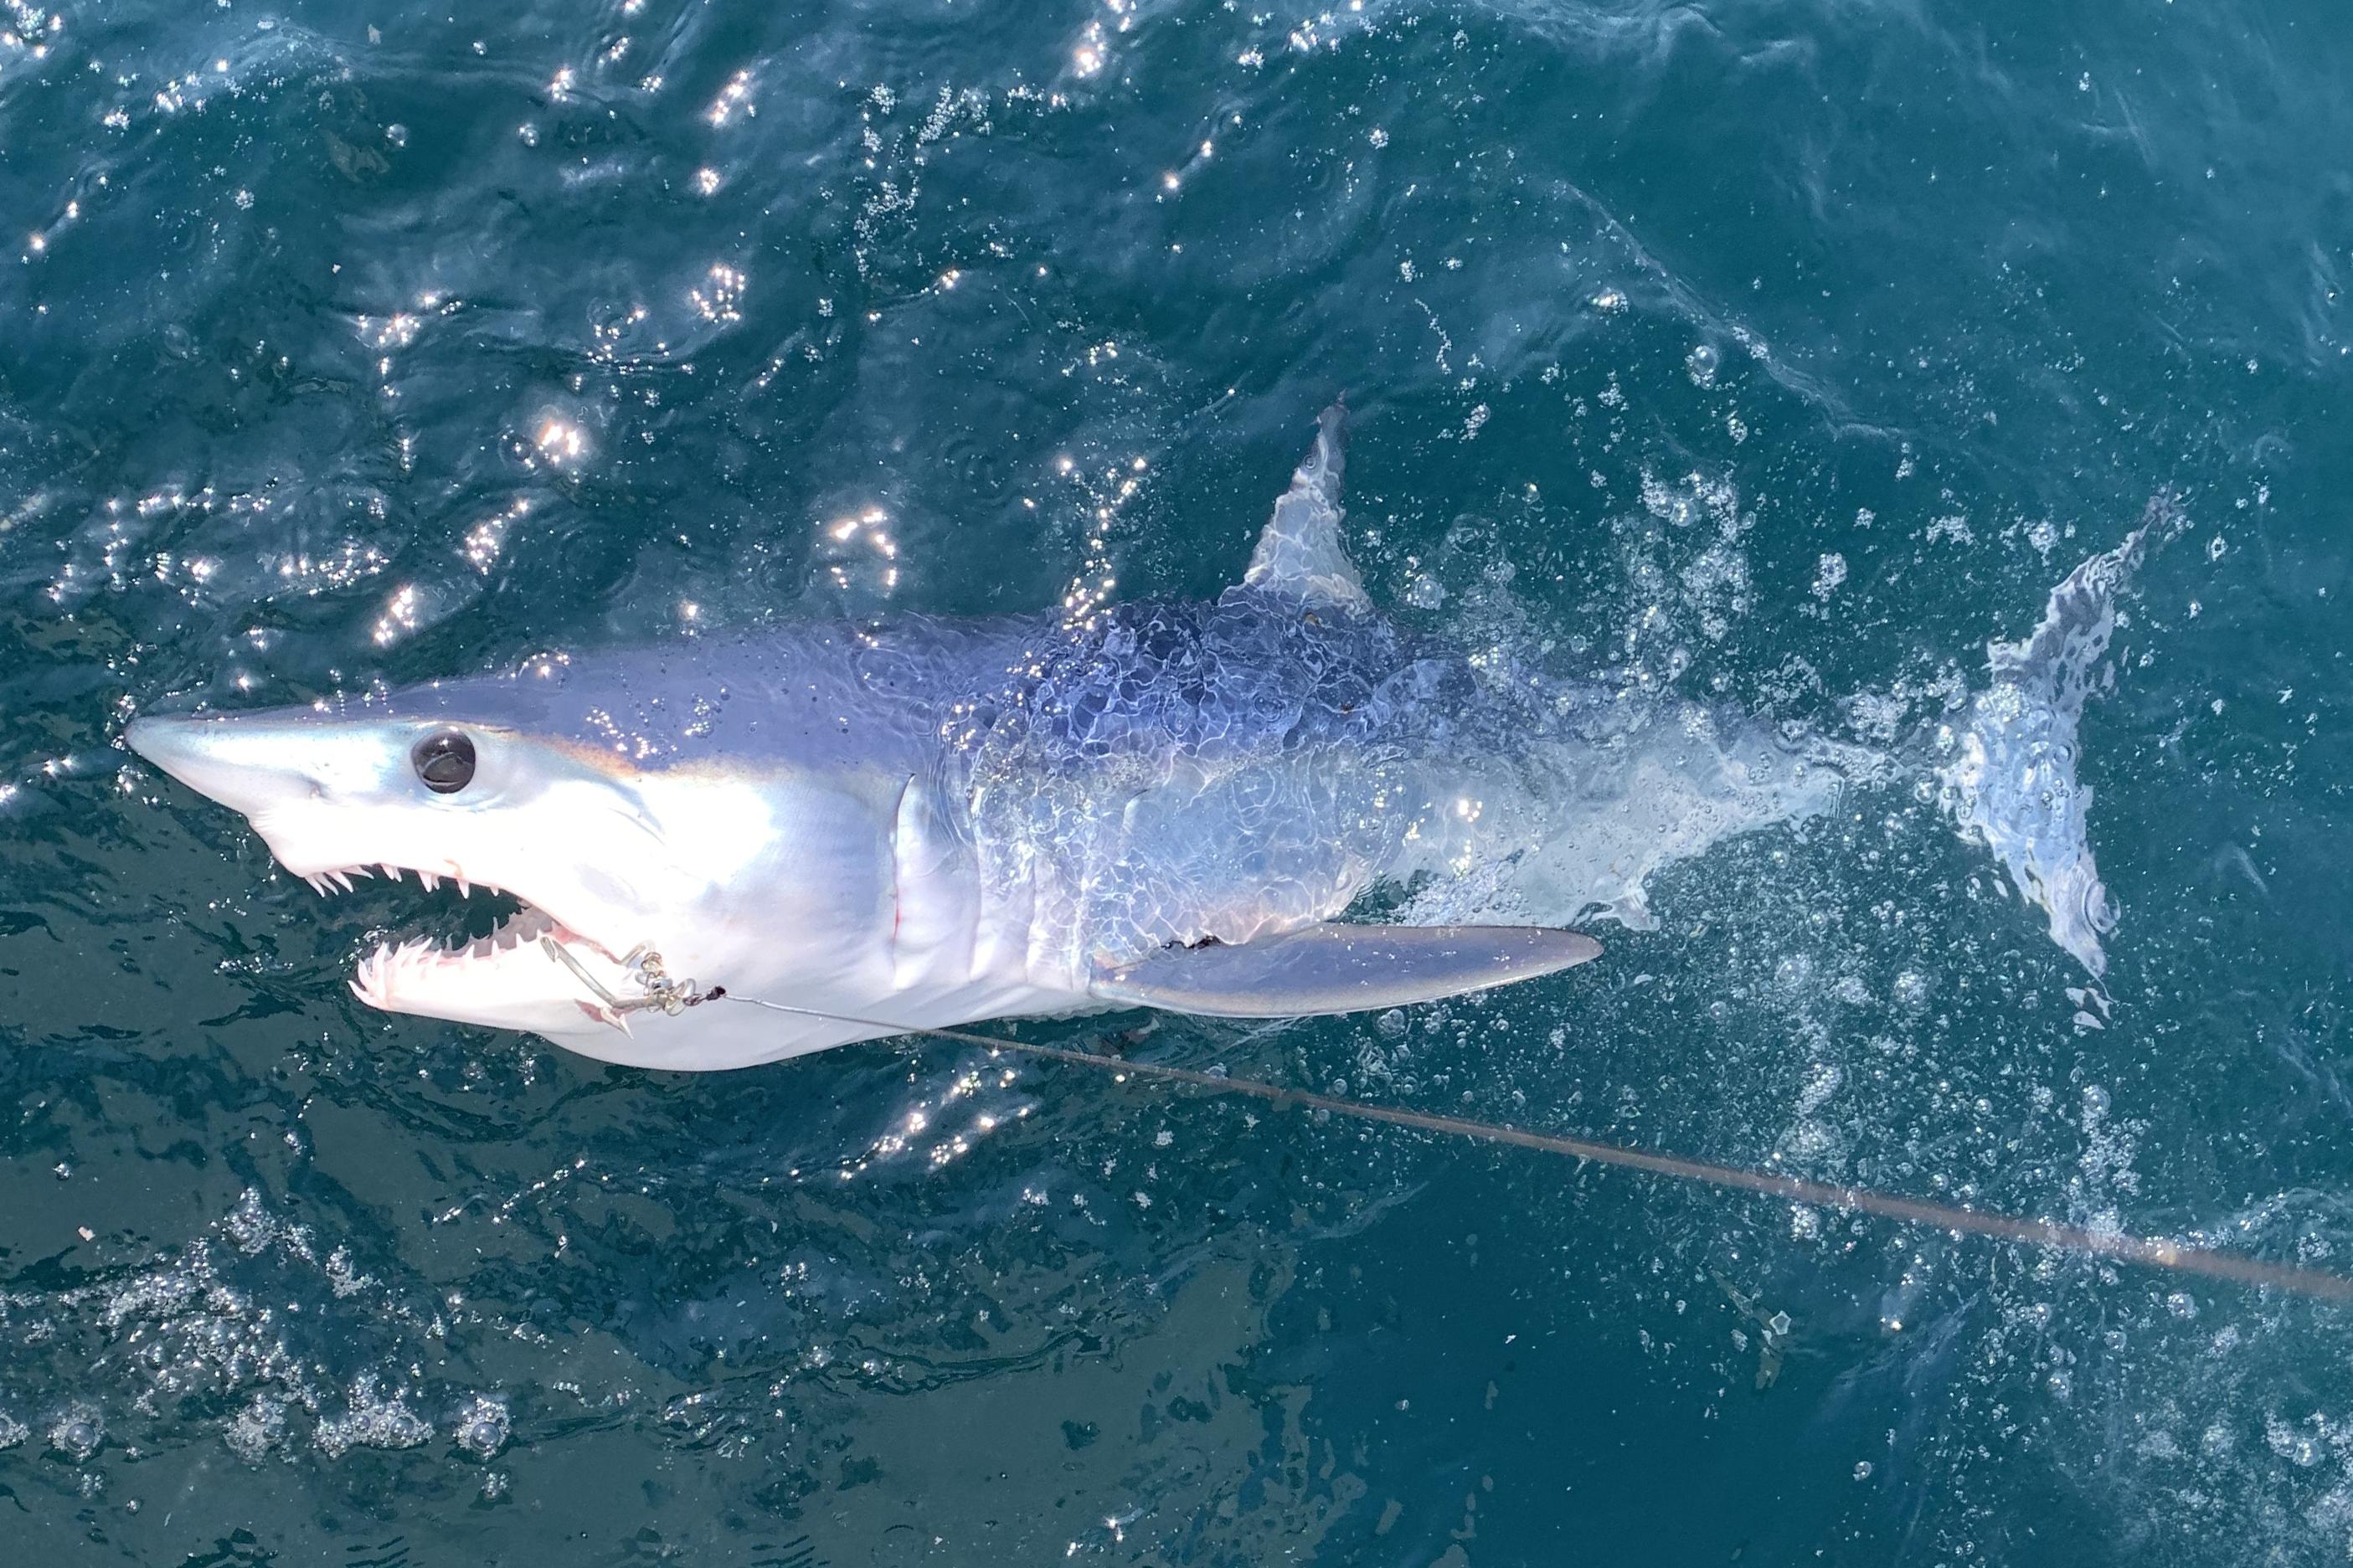 Mako Shark Hook randki pokaż bbc3